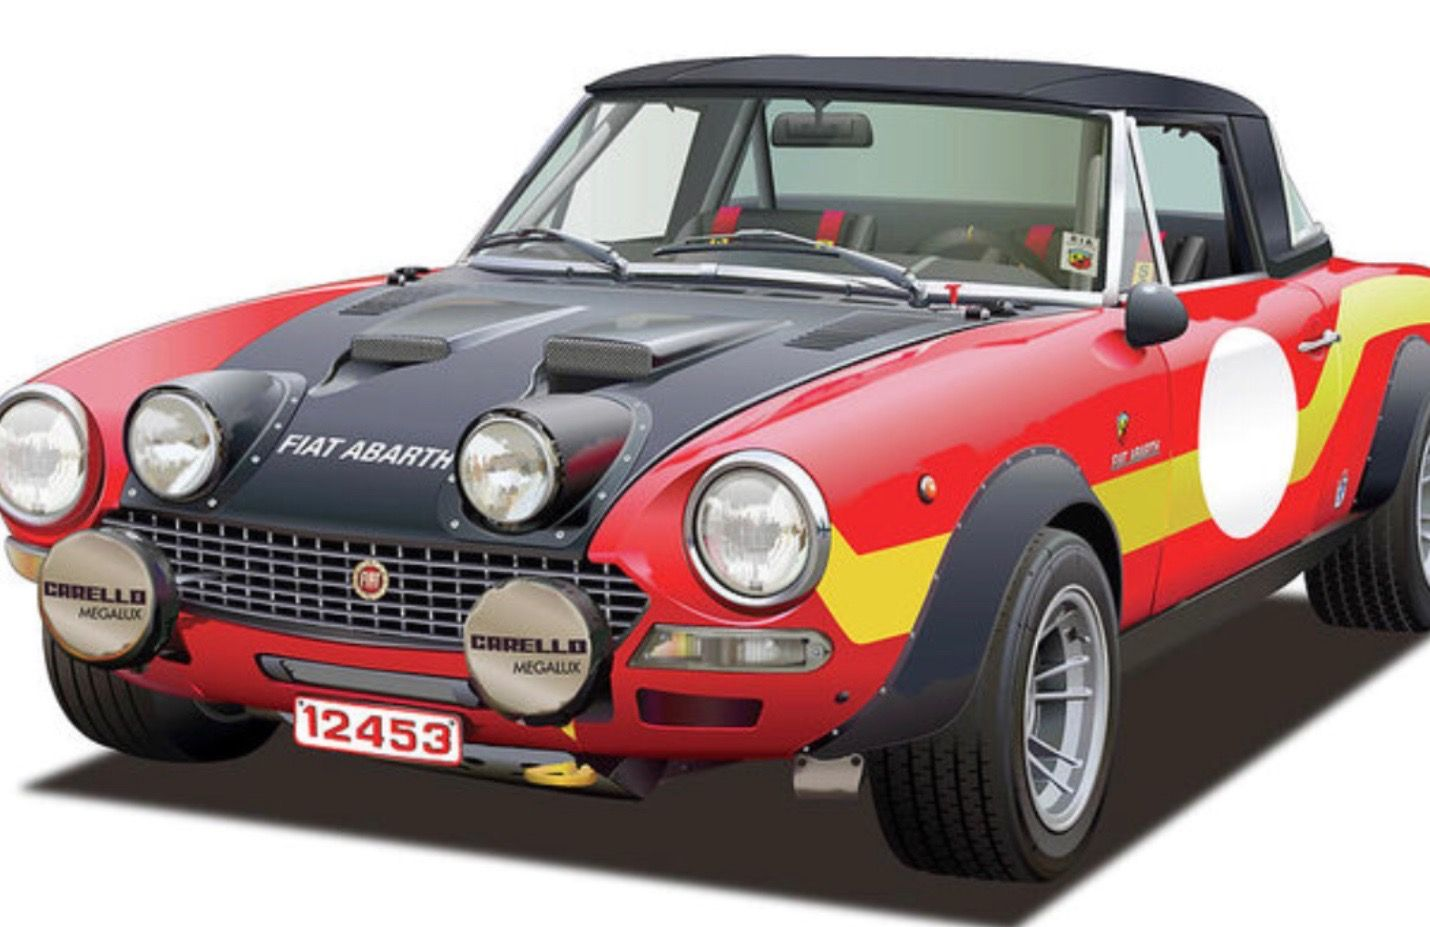 rally raced fiat 124 tuned by abarth auto crazed race rally rh pinterest com